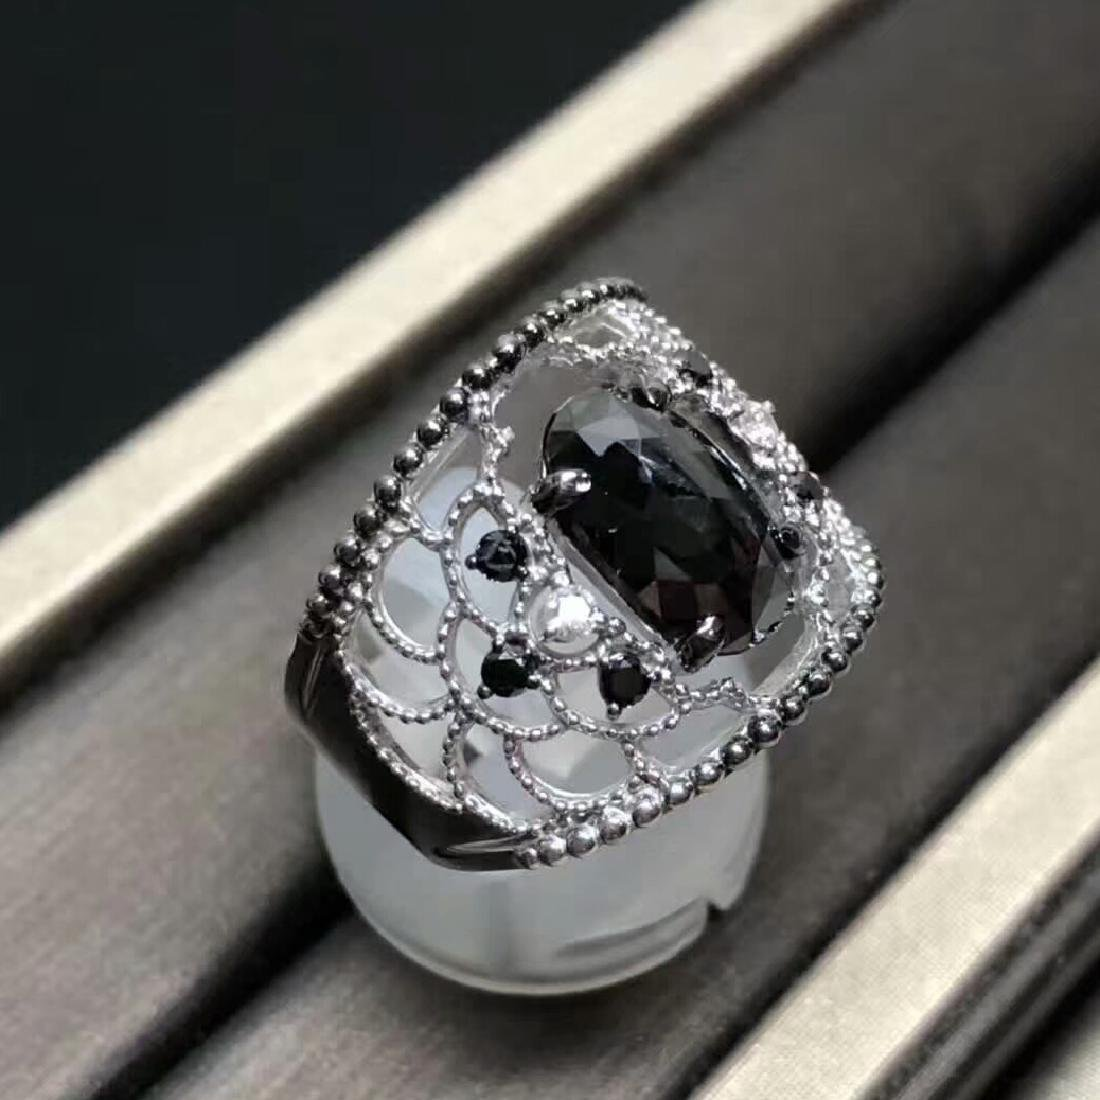 3.16ct Black Diamond Ring in 18kt White Gold - 2